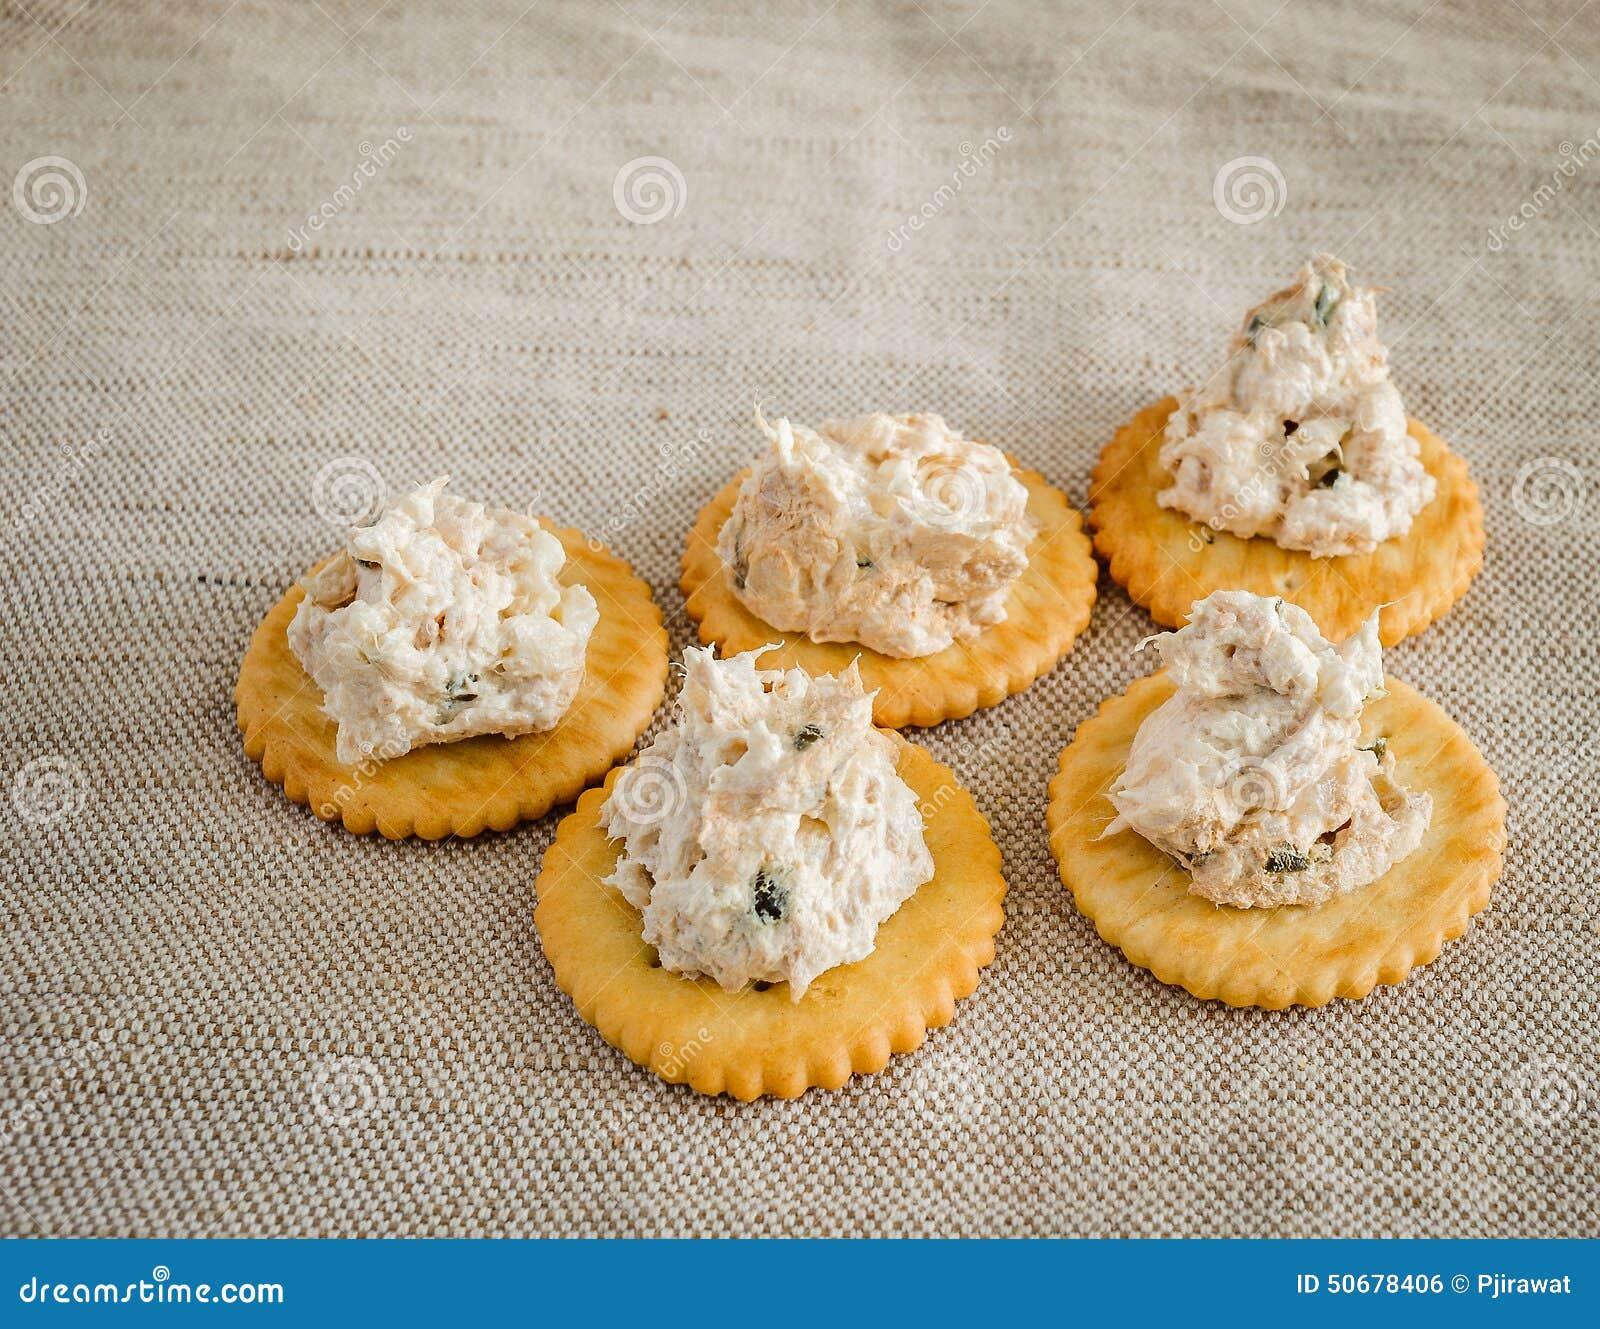 Download 与金枪鱼传播的薄脆饼干 库存照片. 图片 包括有 营养, 鲜美, 片式, 牌照, 生气勃勃, 美食, 被扭伤的 - 50678406